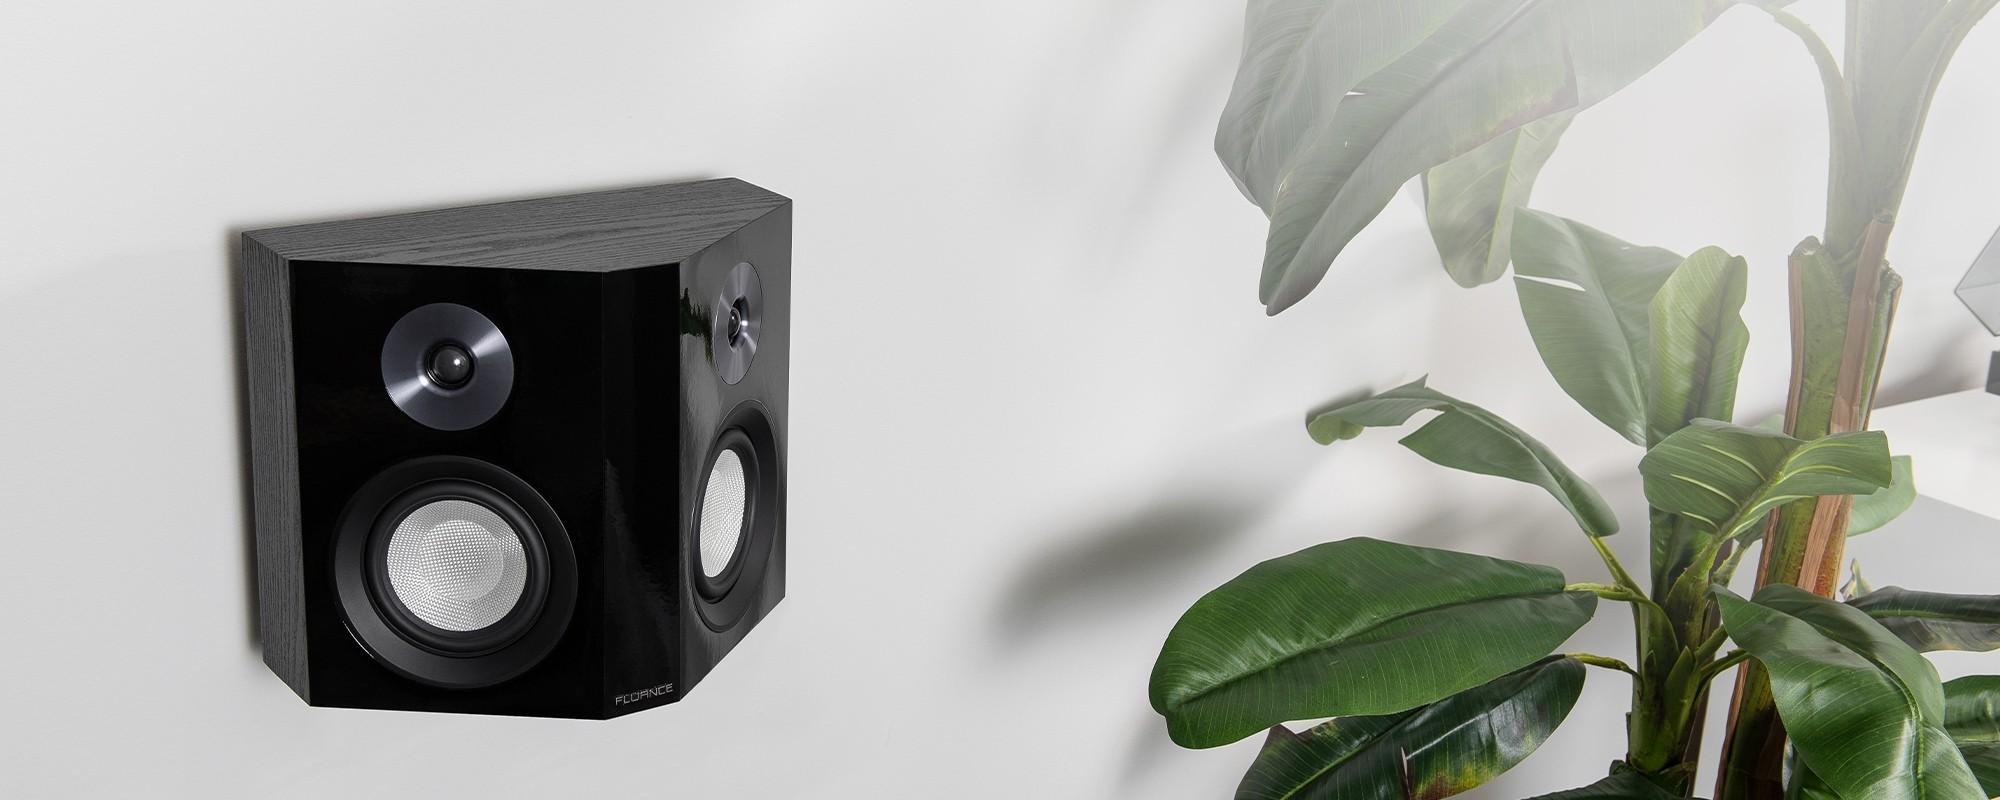 XLBP Bipolar Surround Sound Speaker with plant